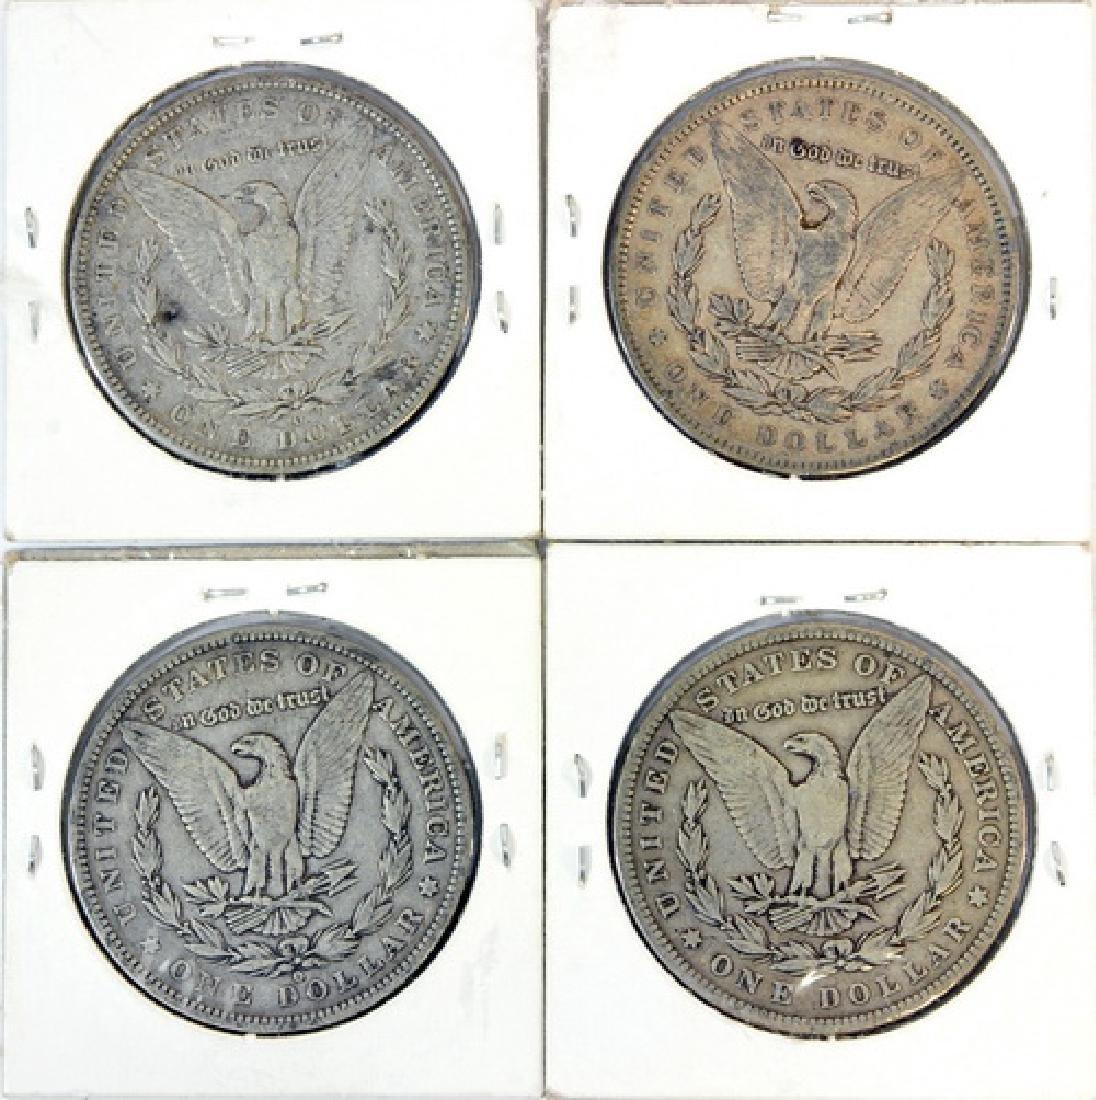 10 Morgan Silver Dollars - 4